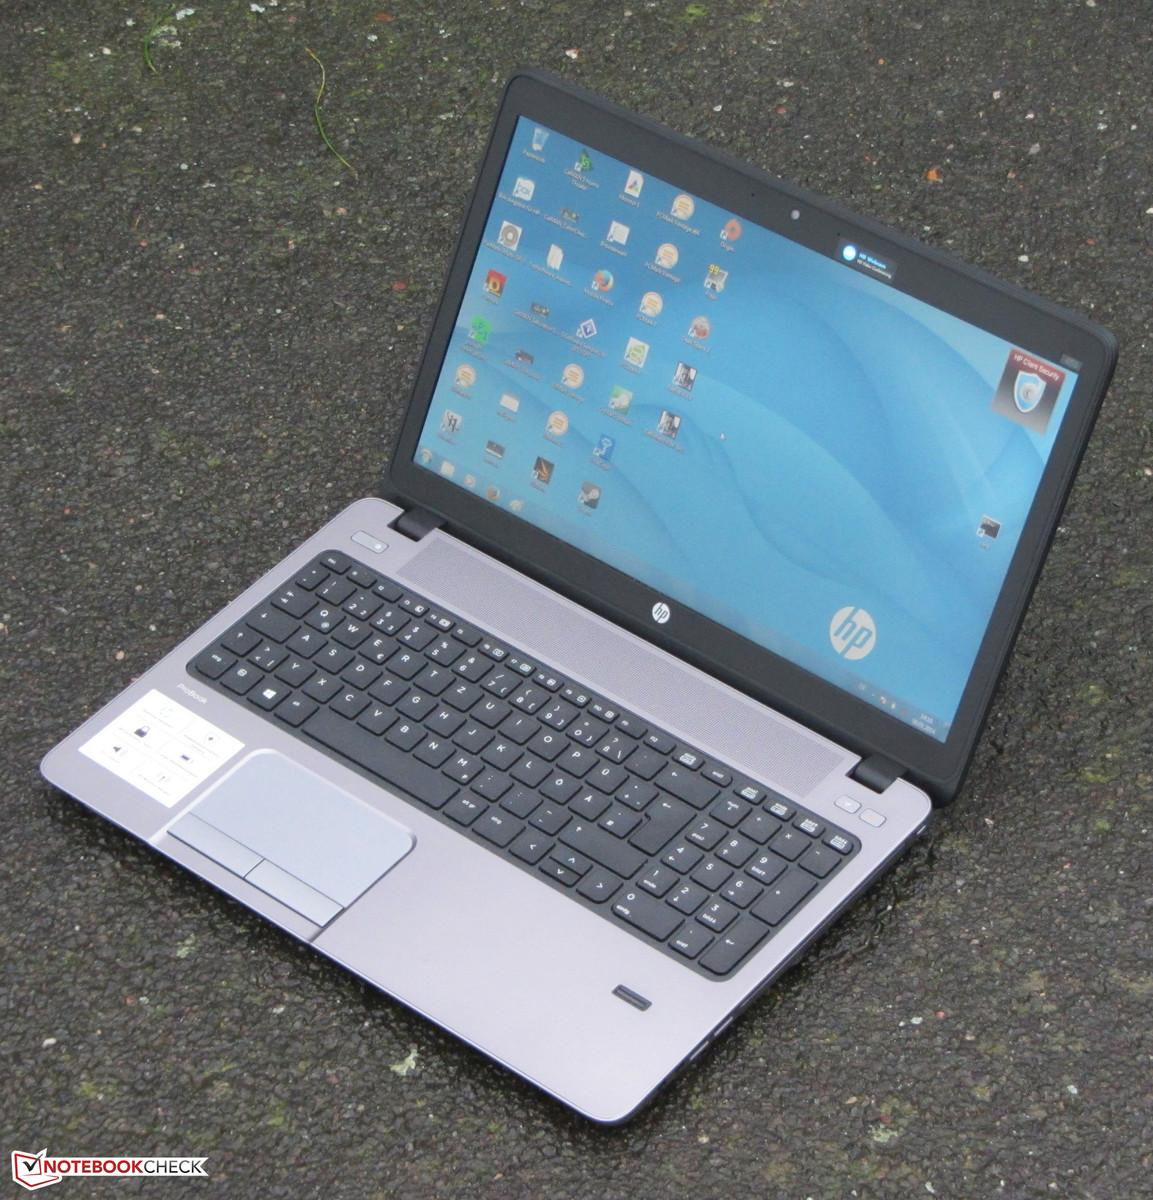 Hp notebook wireless driver - Hp Elitebook 840 G1 Wireless Driver